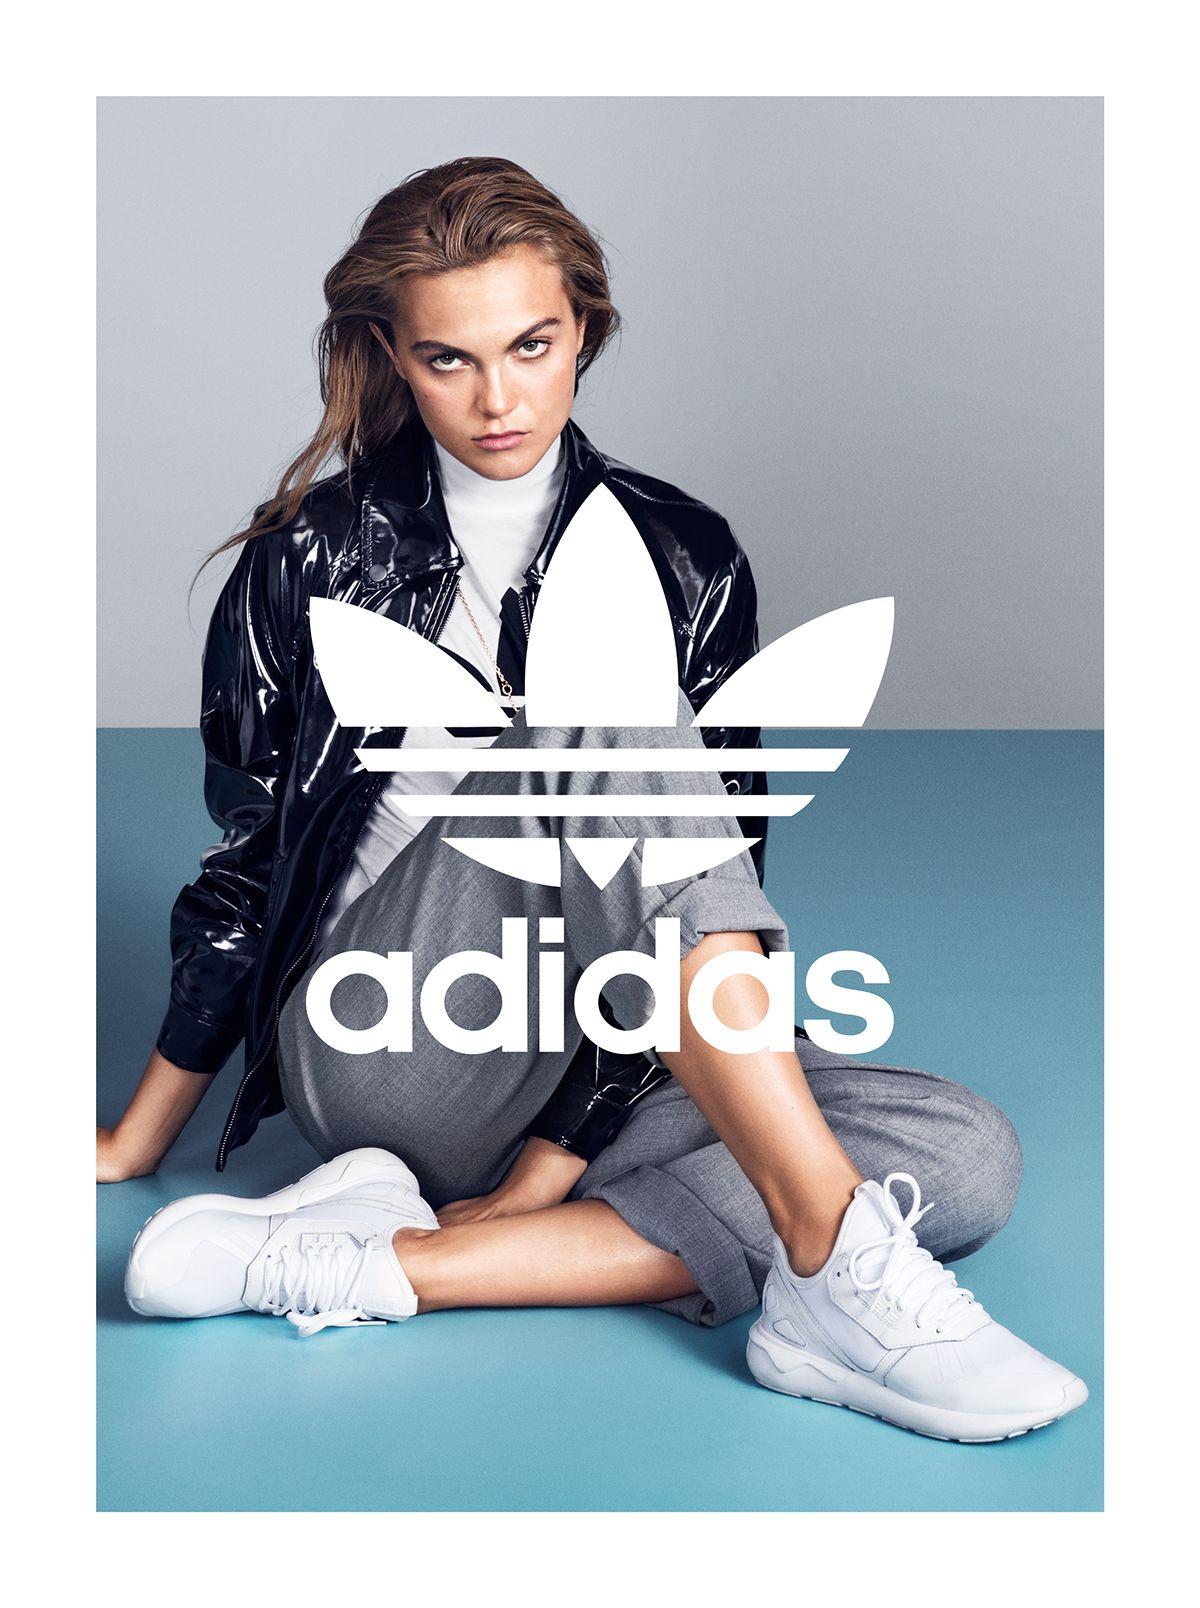 Adidas Originals On Behance Adidas Fashion Adidas Adidas Ad